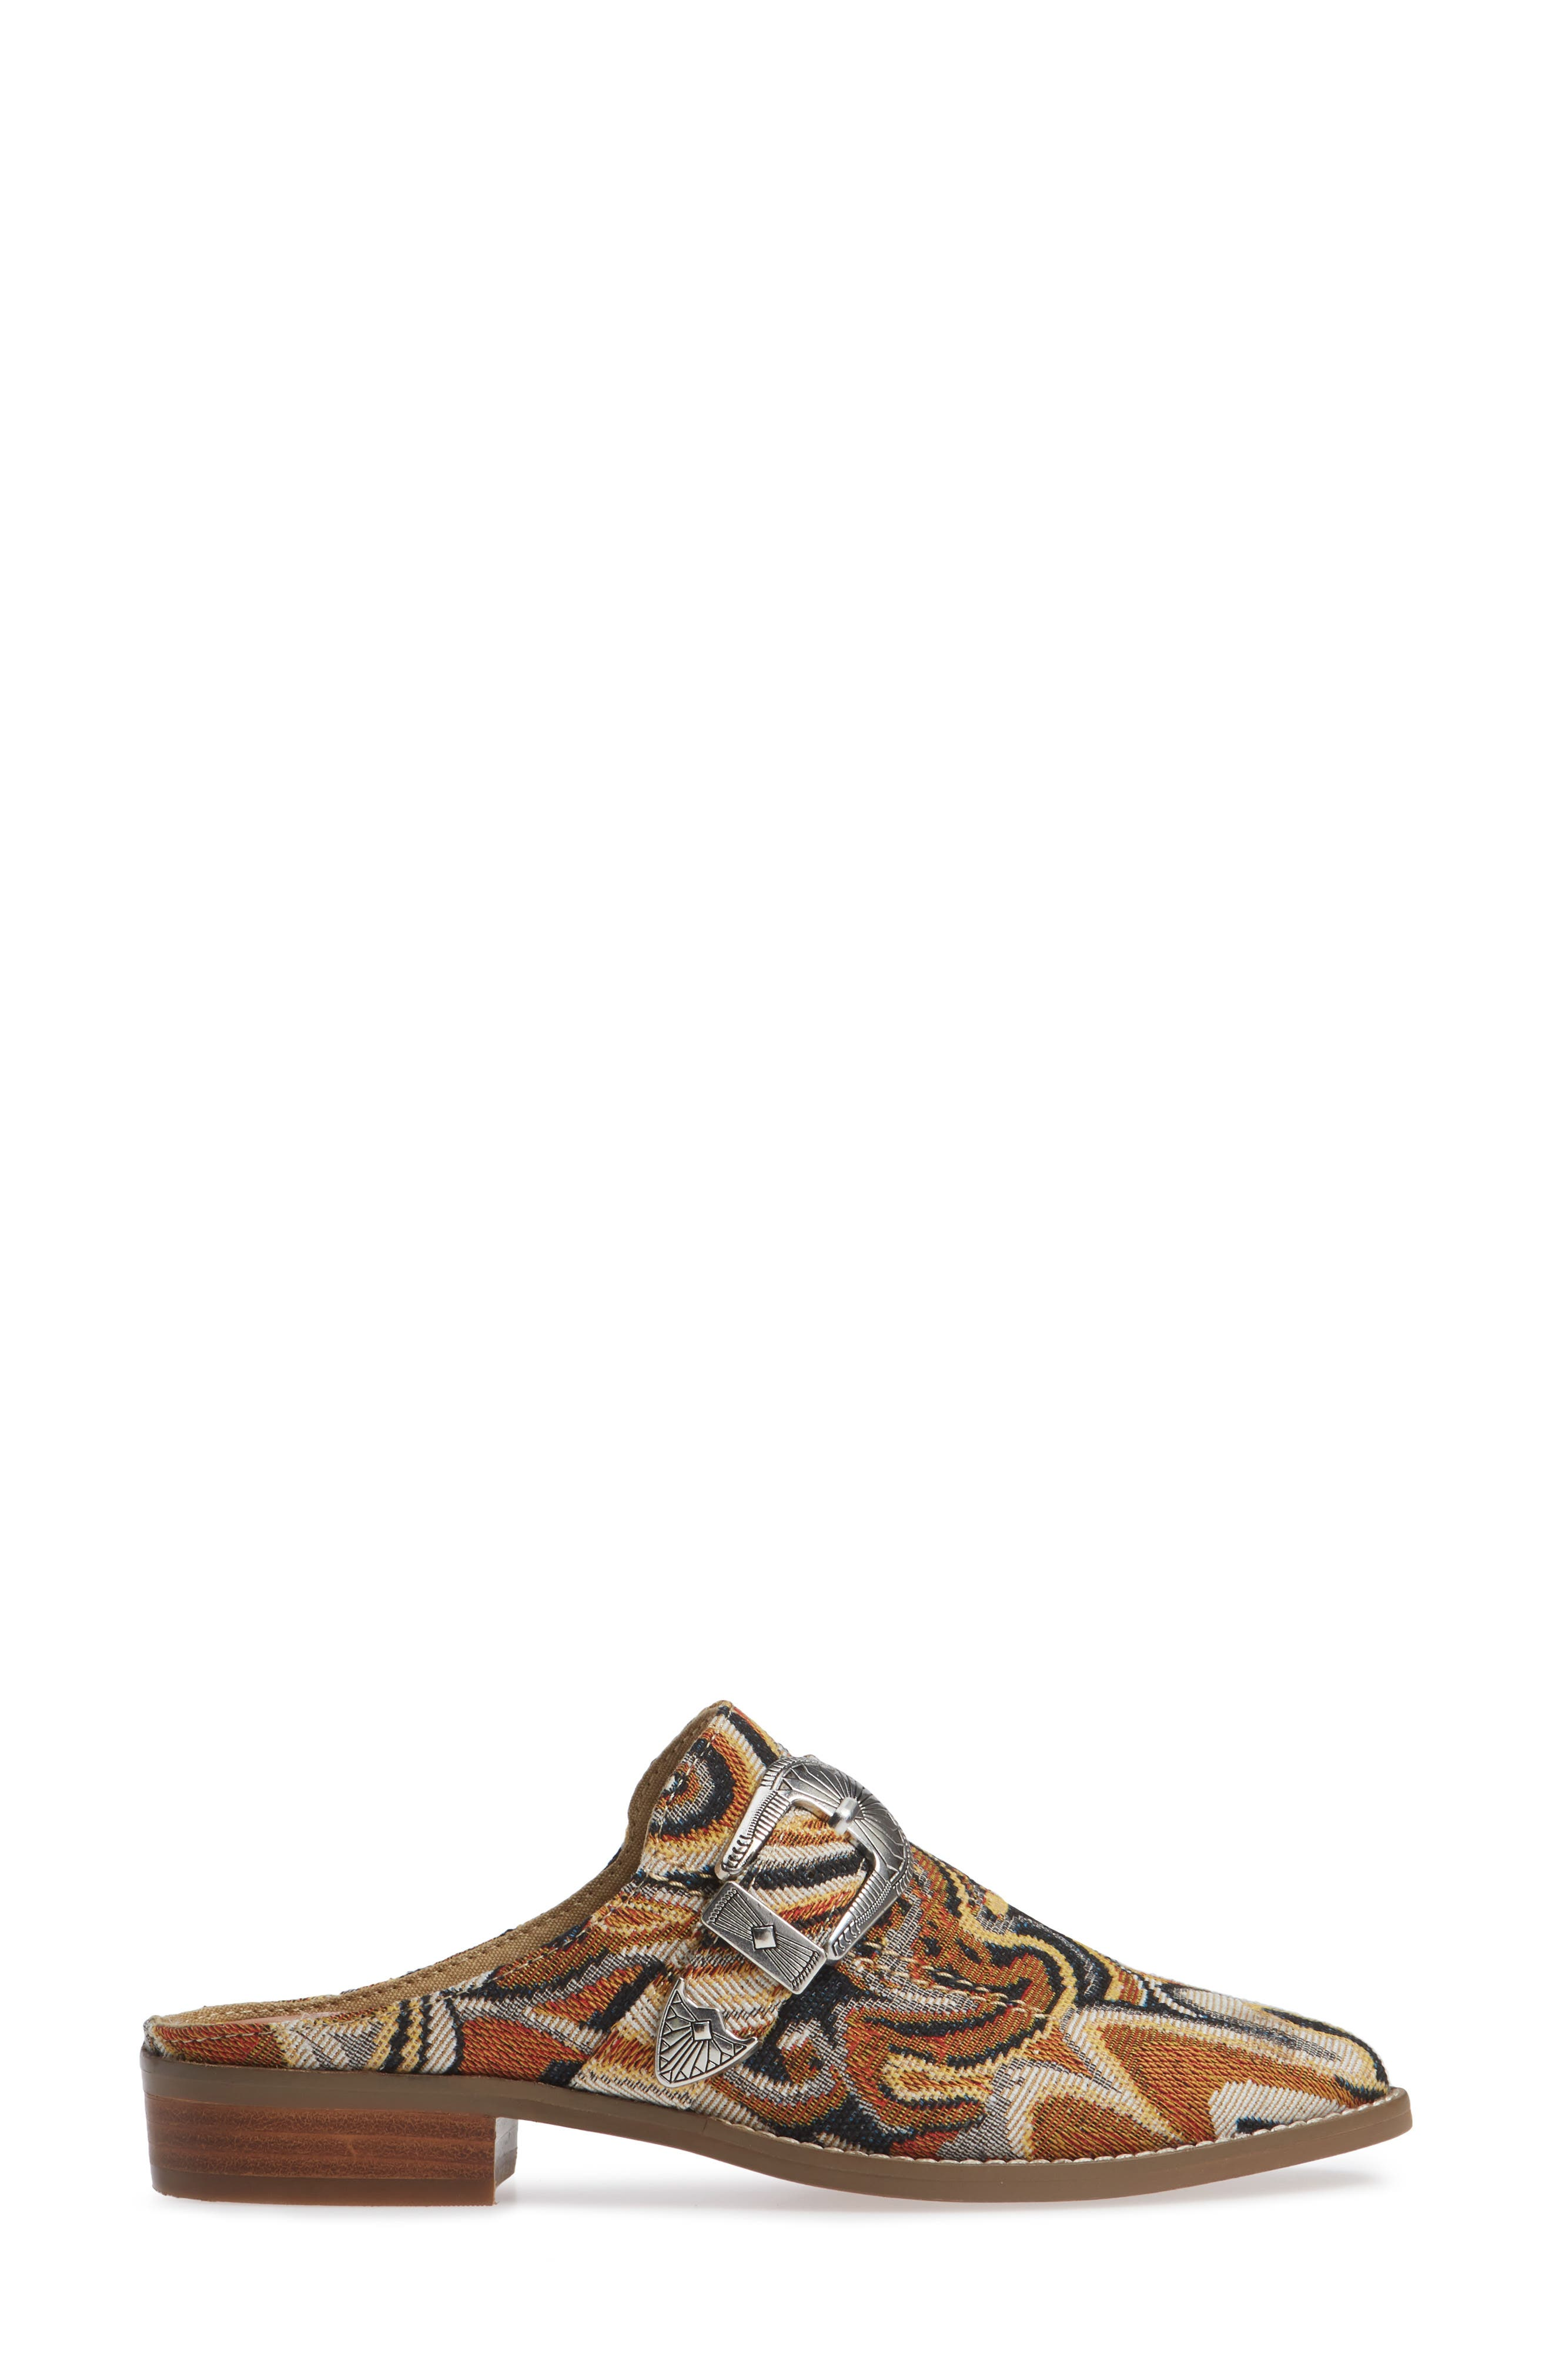 Greta Mule,                             Alternate thumbnail 3, color,                             JACQUARD SWIRL NATURAL MULTI